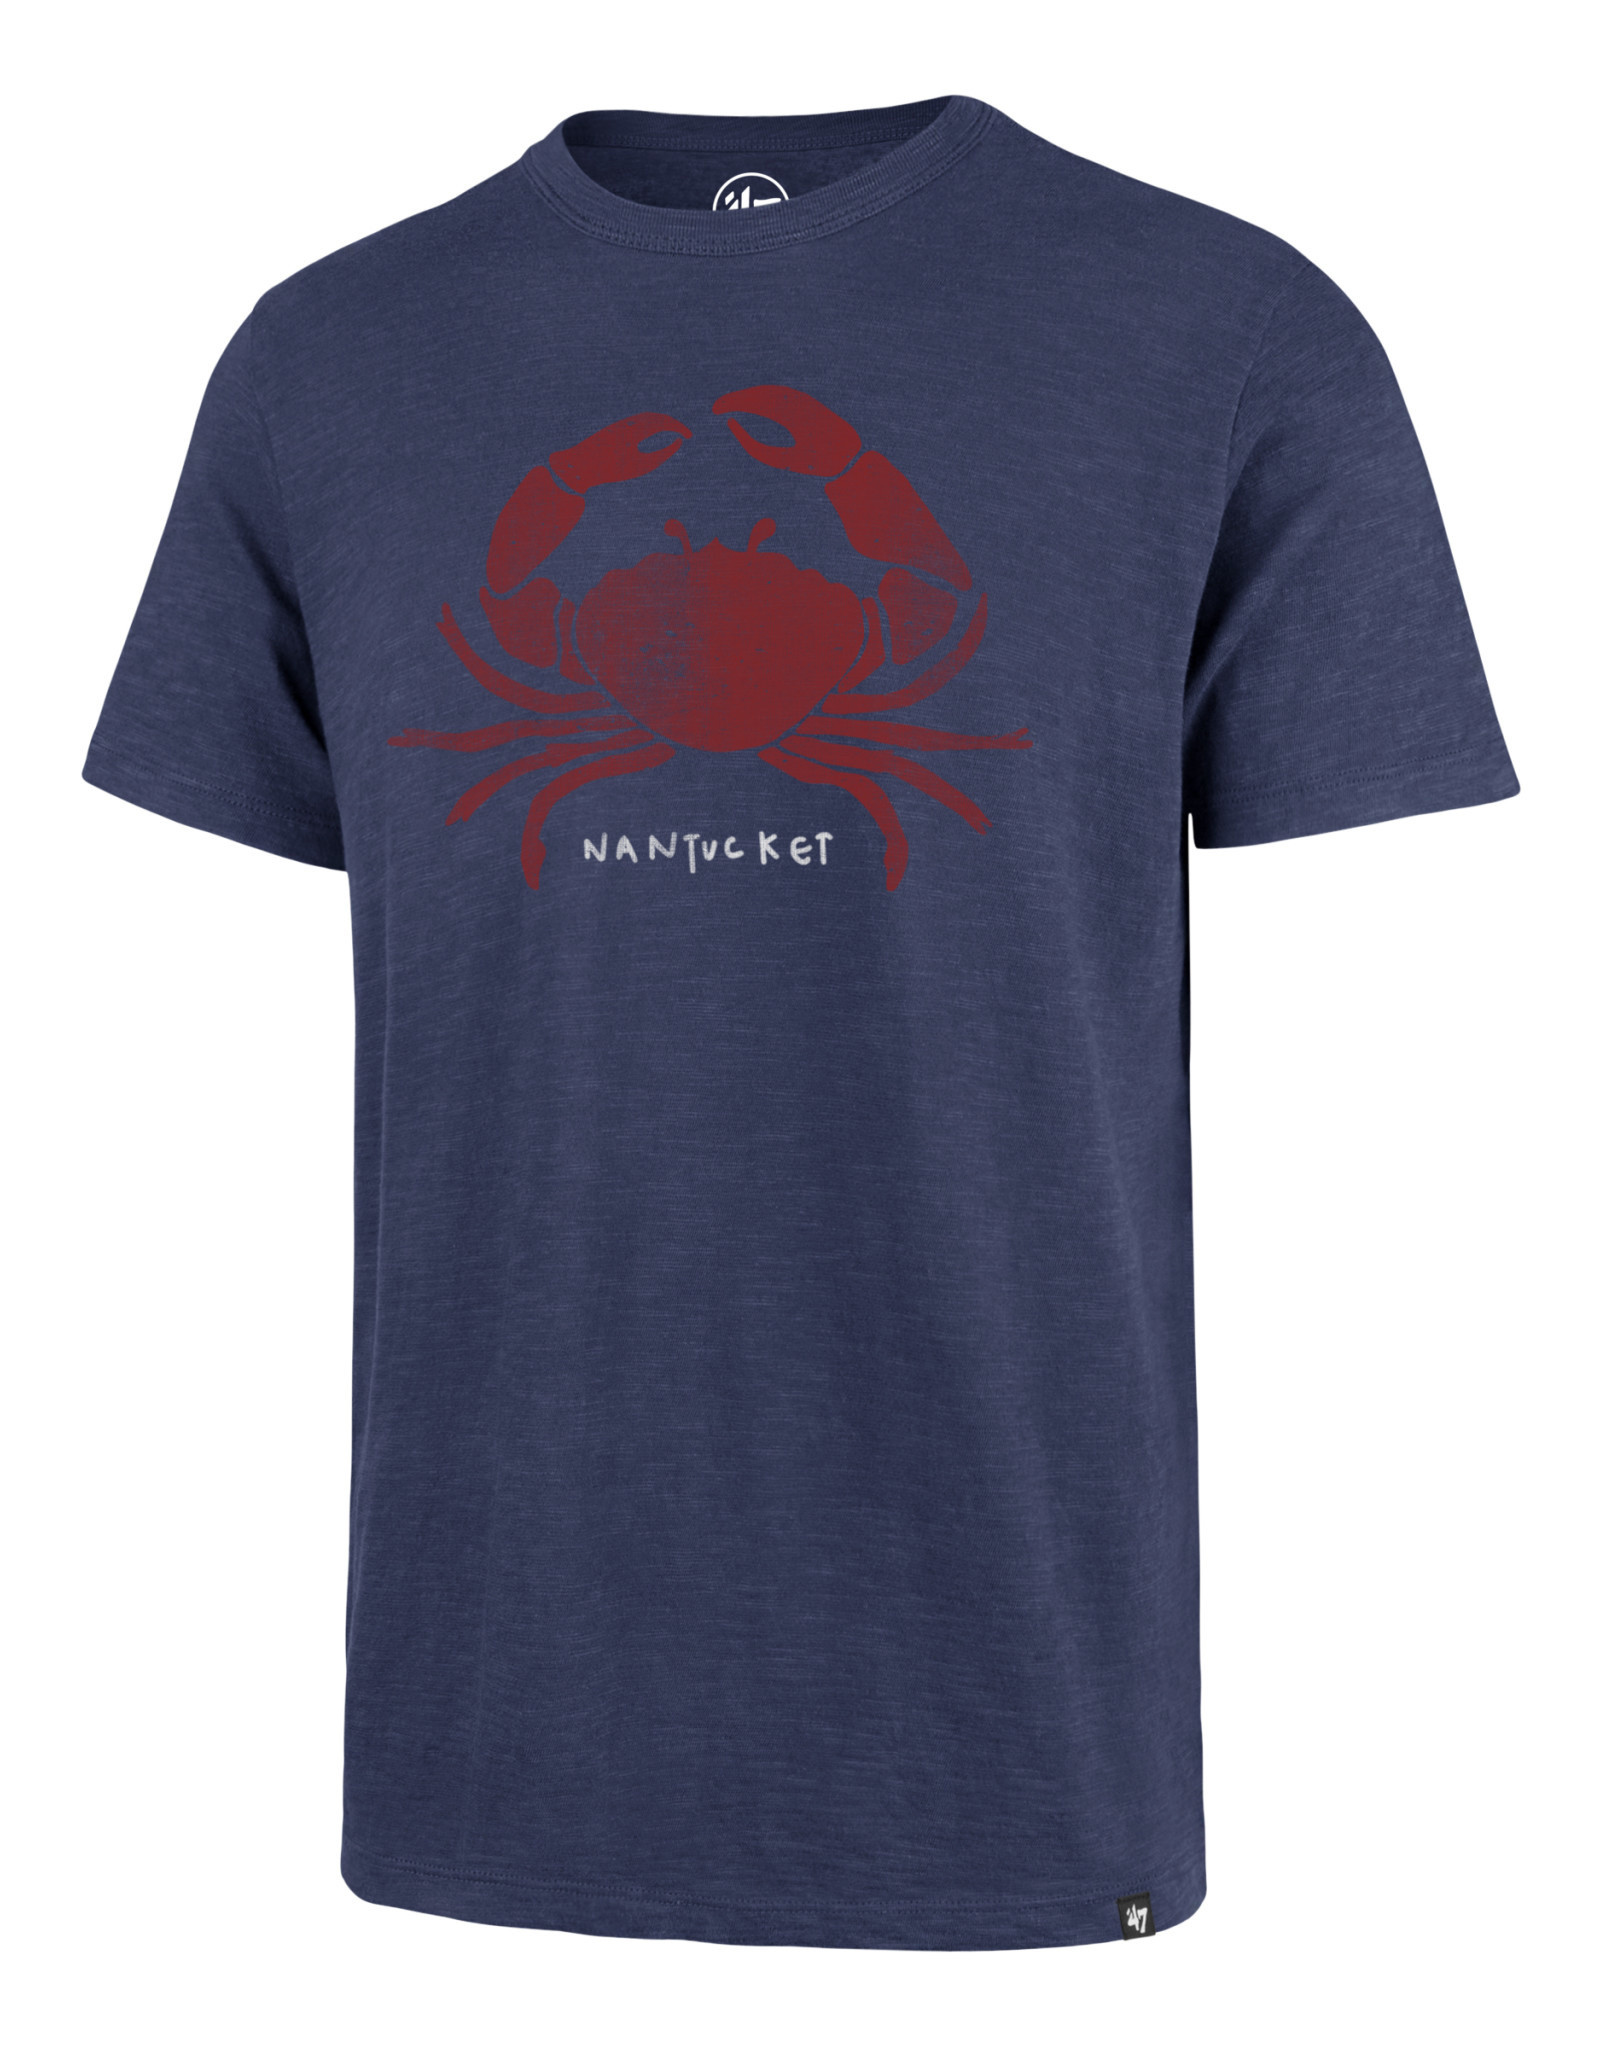 47 Brand 47 Unisex Tee Crab